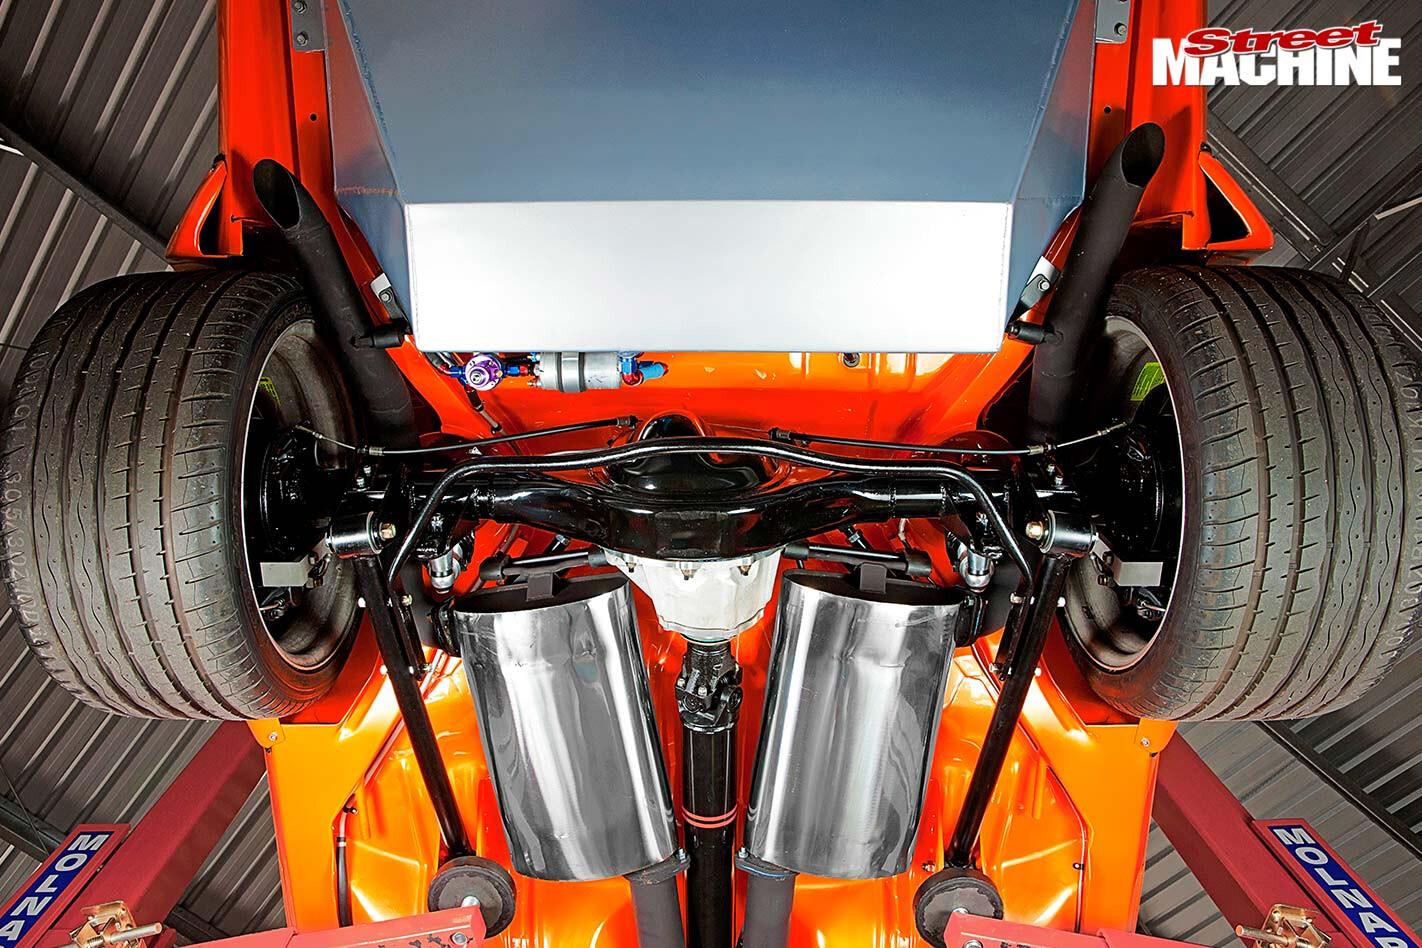 Holden Torana A9X replica underside